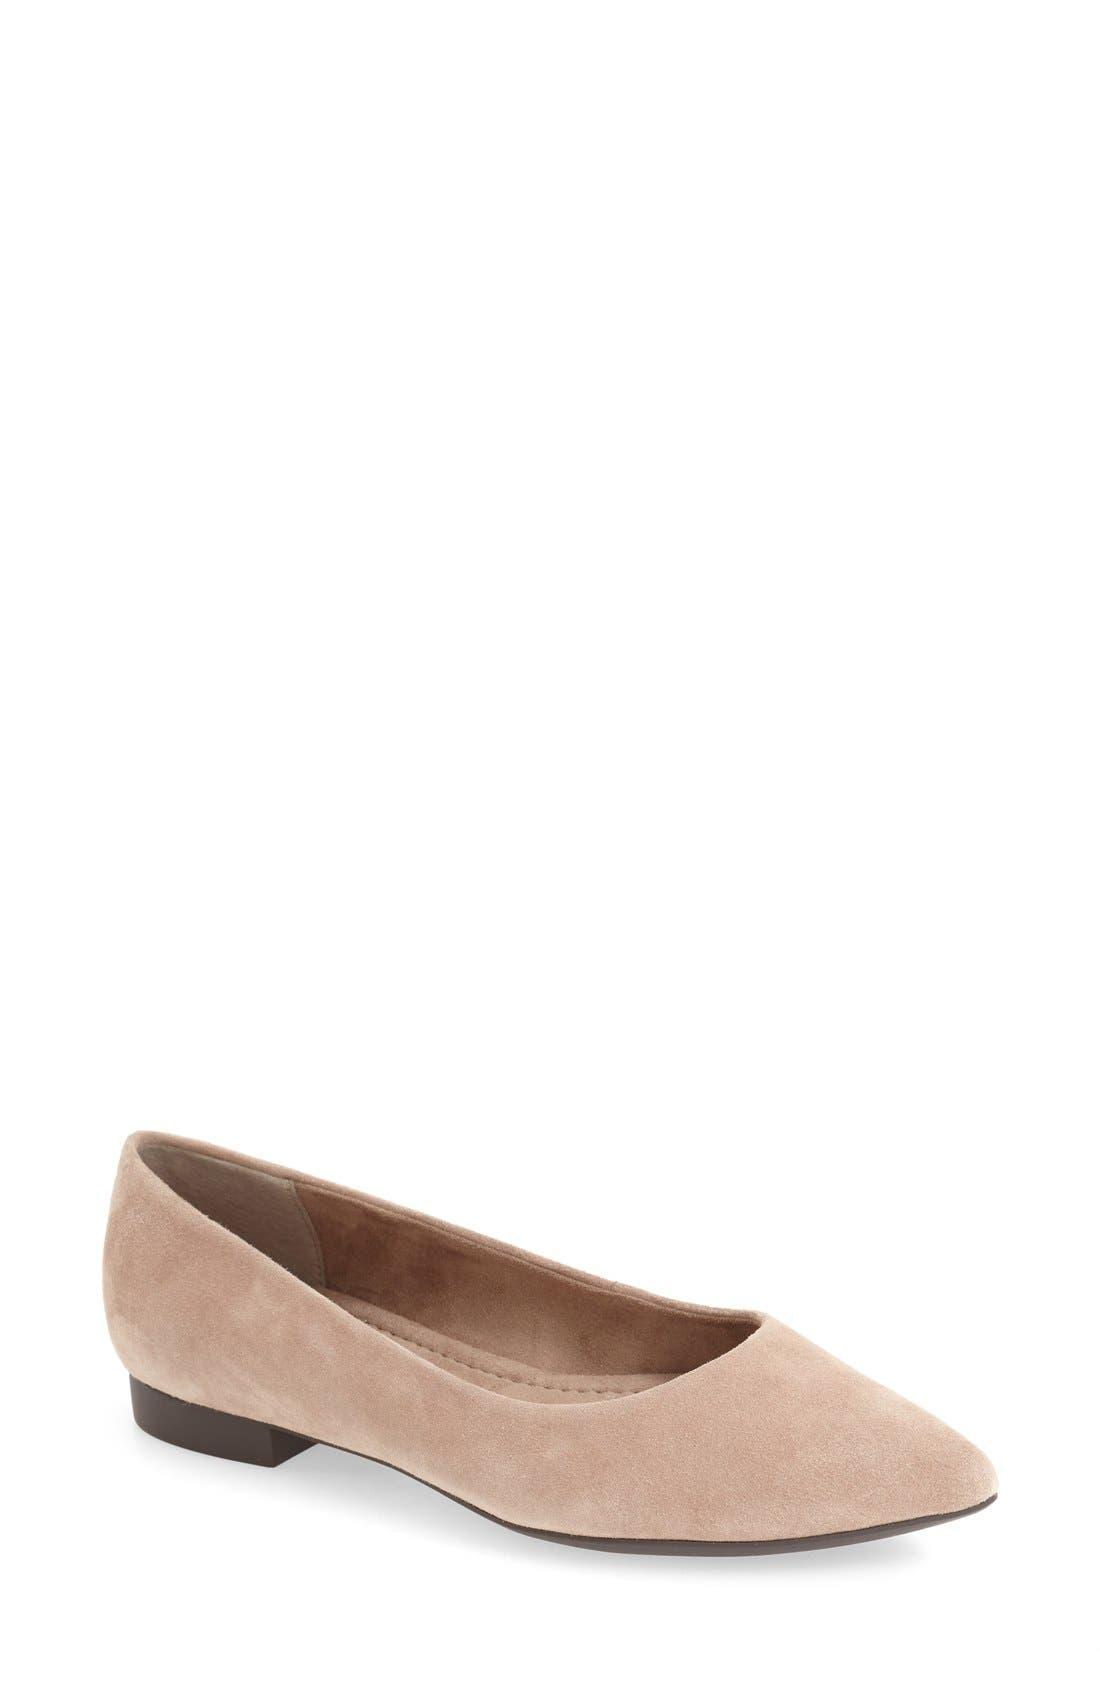 Alternate Image 1 Selected - Bella Vita 'Vivien' Pointy Toe Flat (Women)